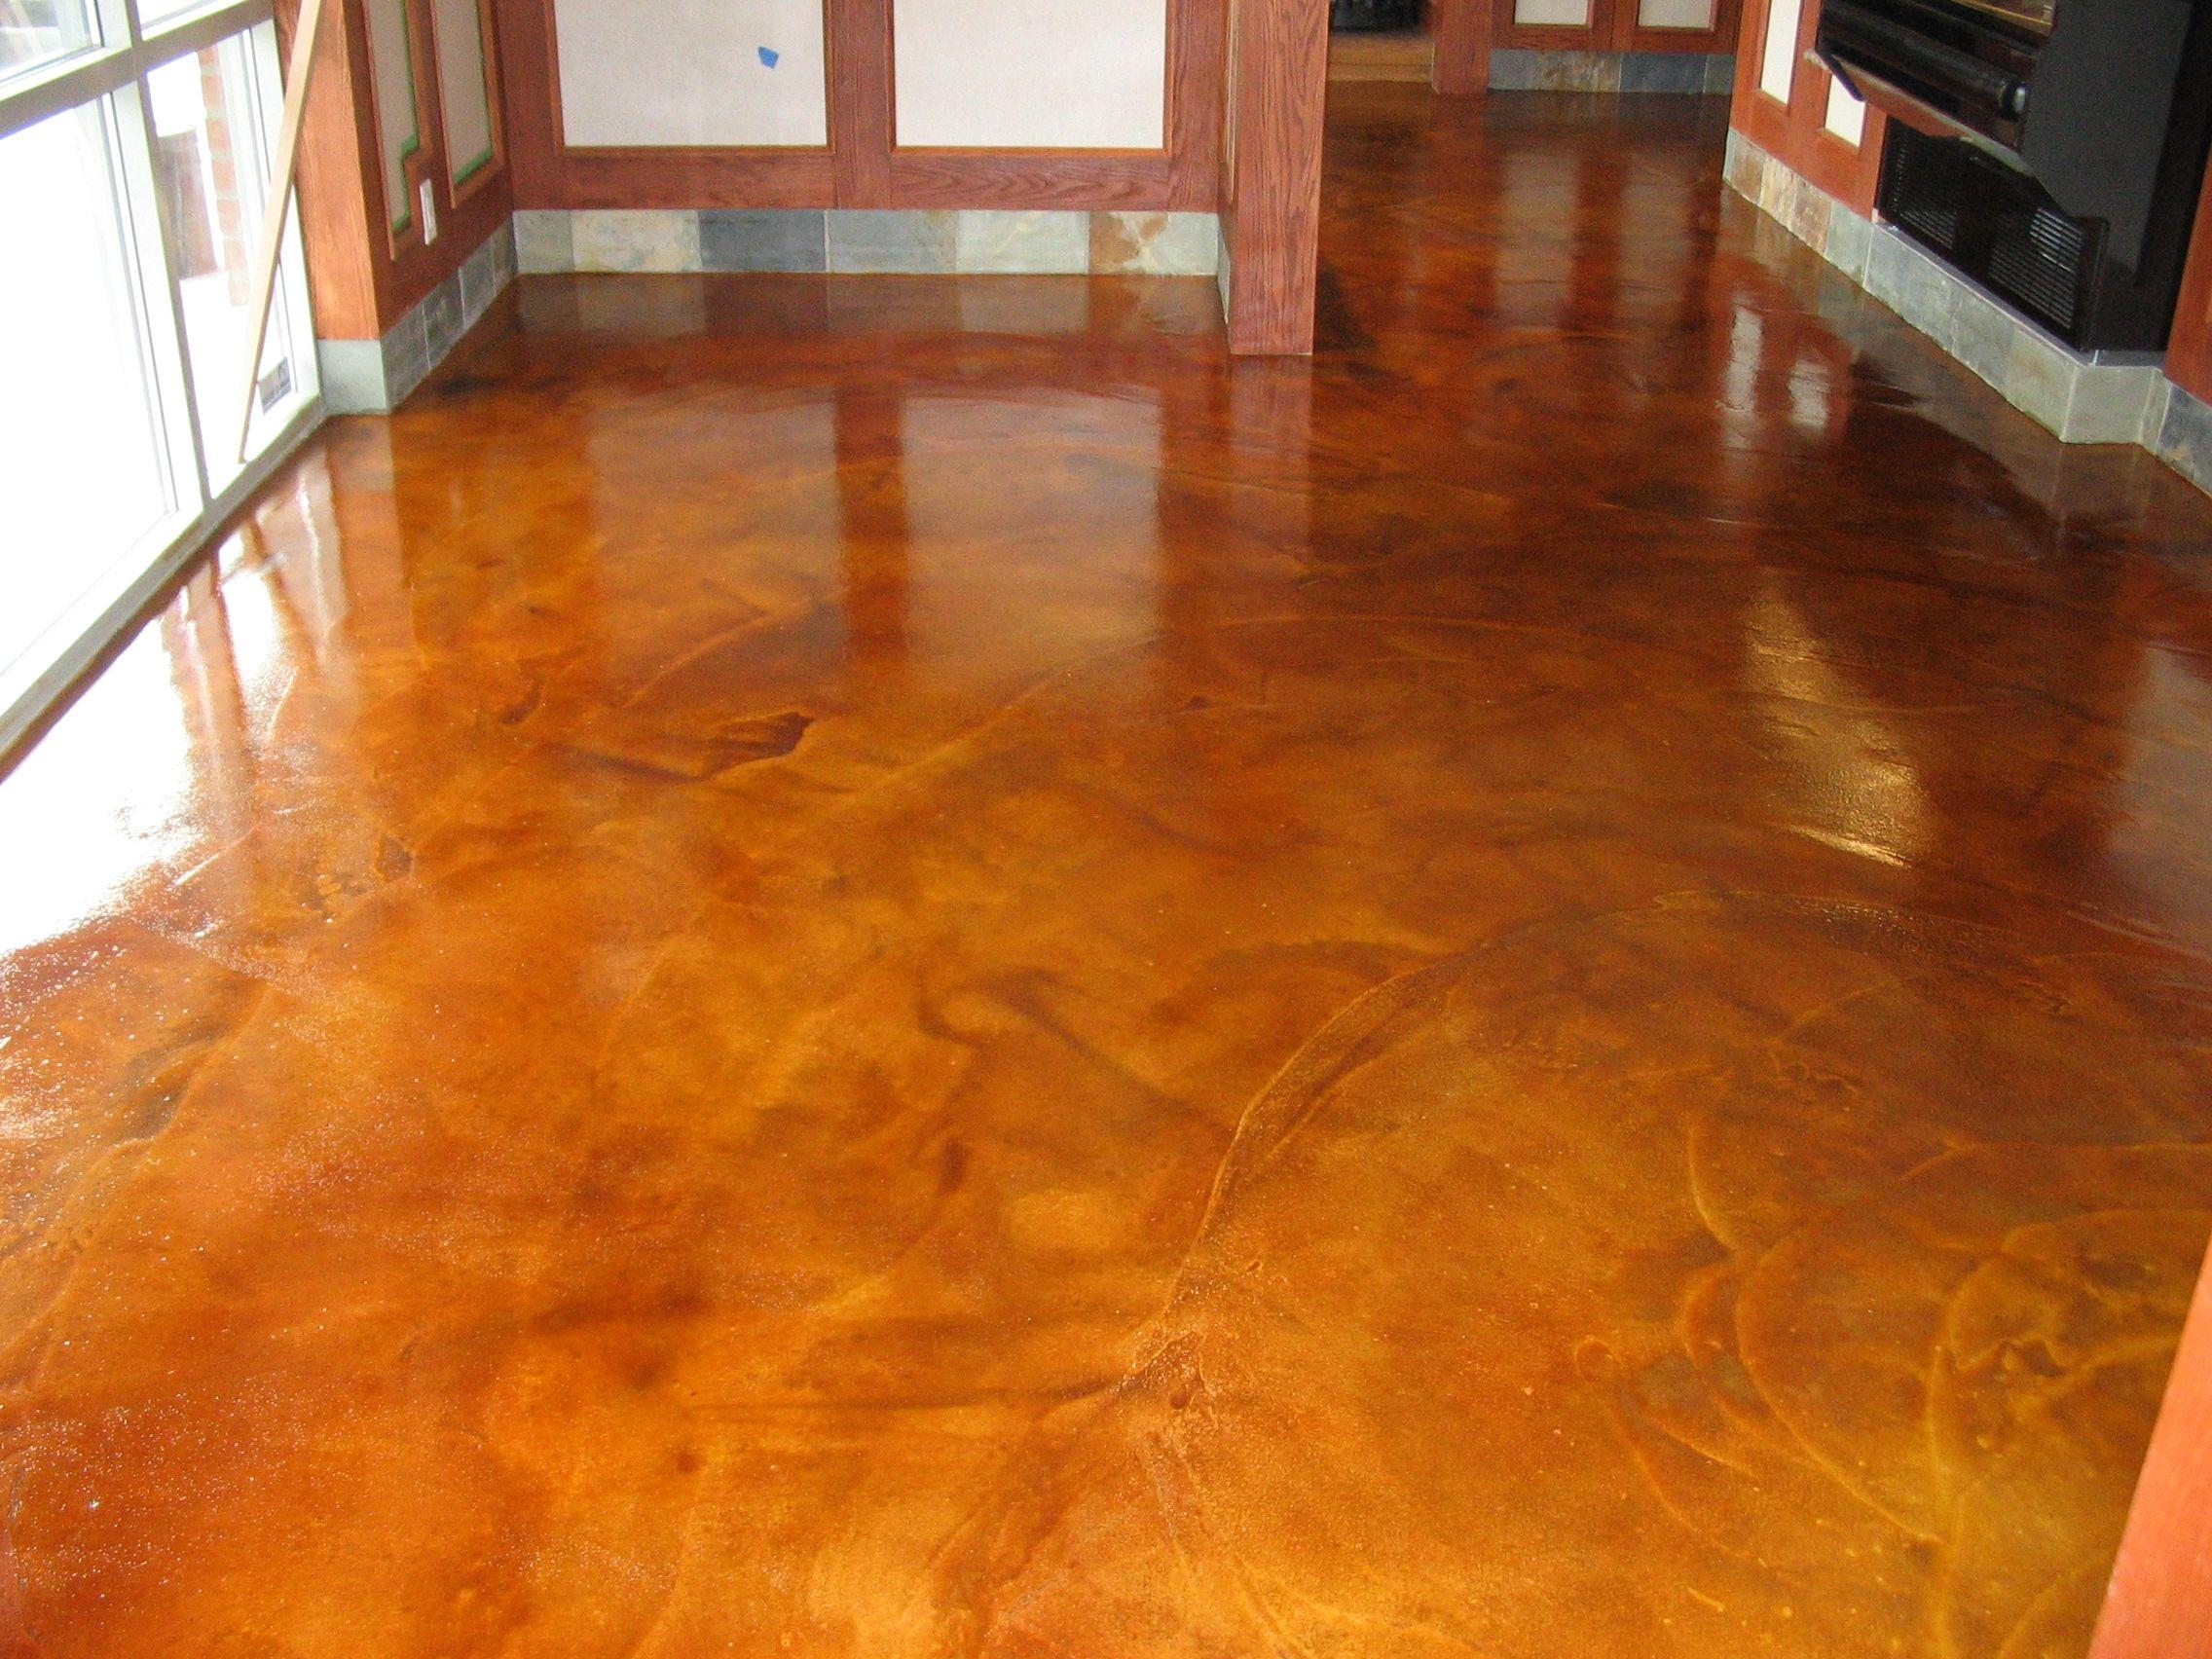 Rustic Concrete Floors High Gloss Acid Staining Concrete Floors Ideas For Rustic Home Design